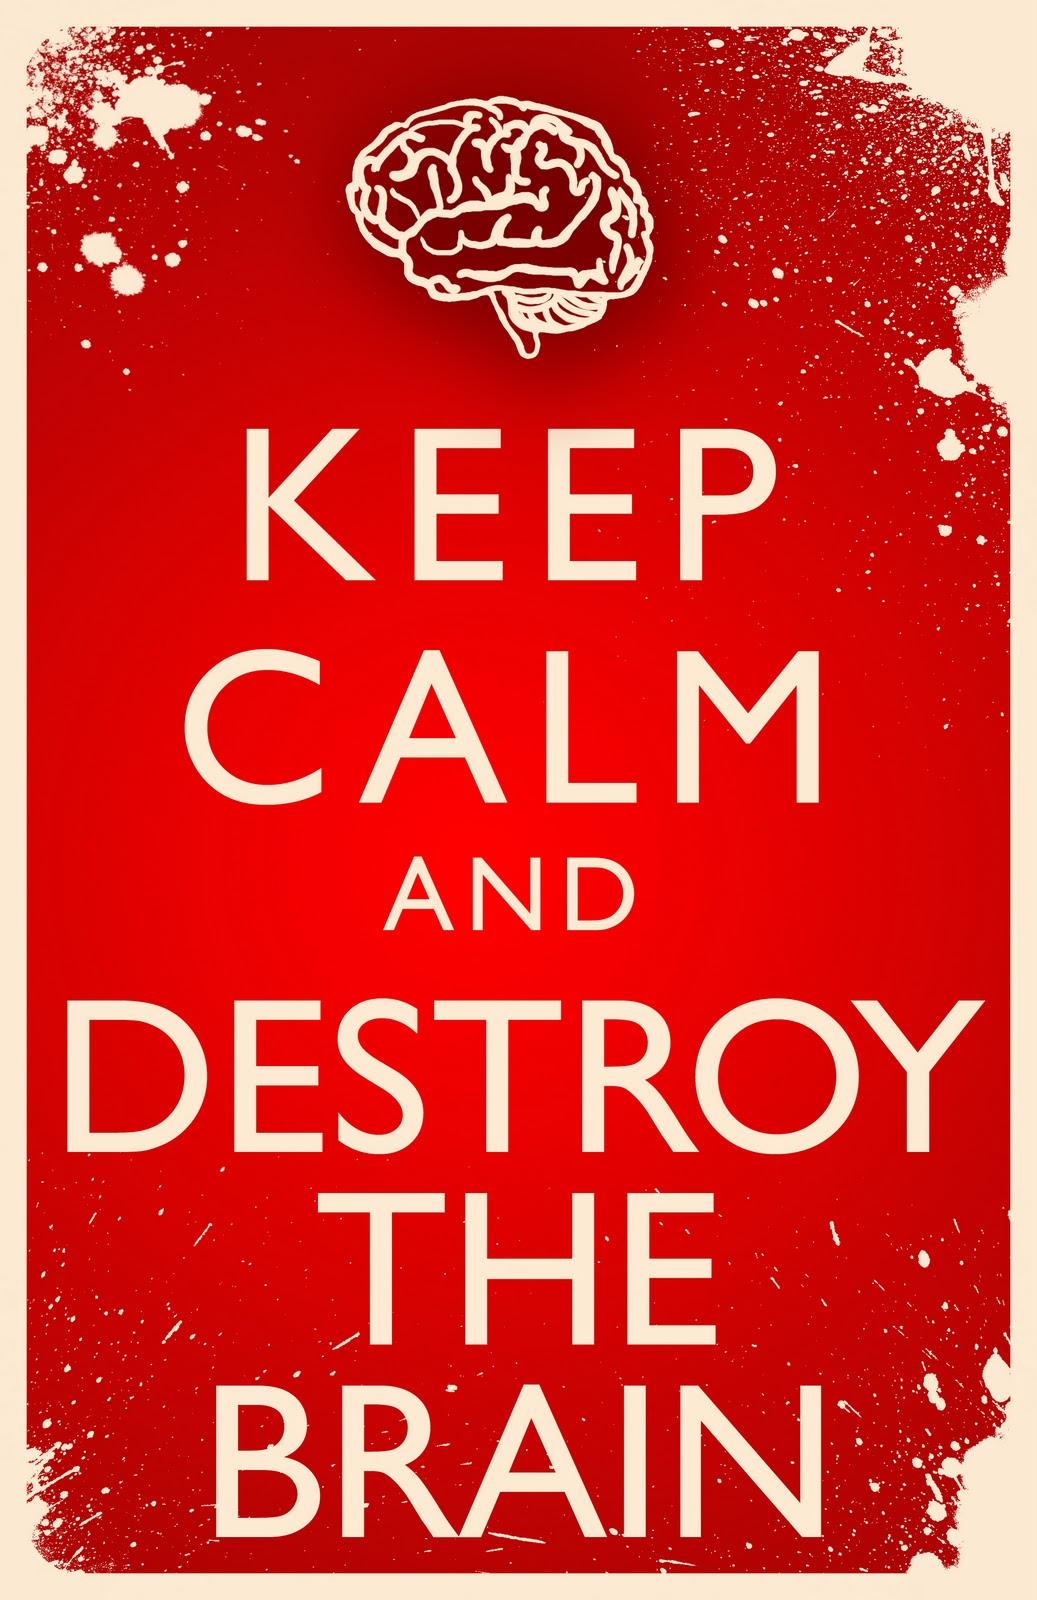 47 Keep Calm Quotes Wallpaper On Wallpapersafari